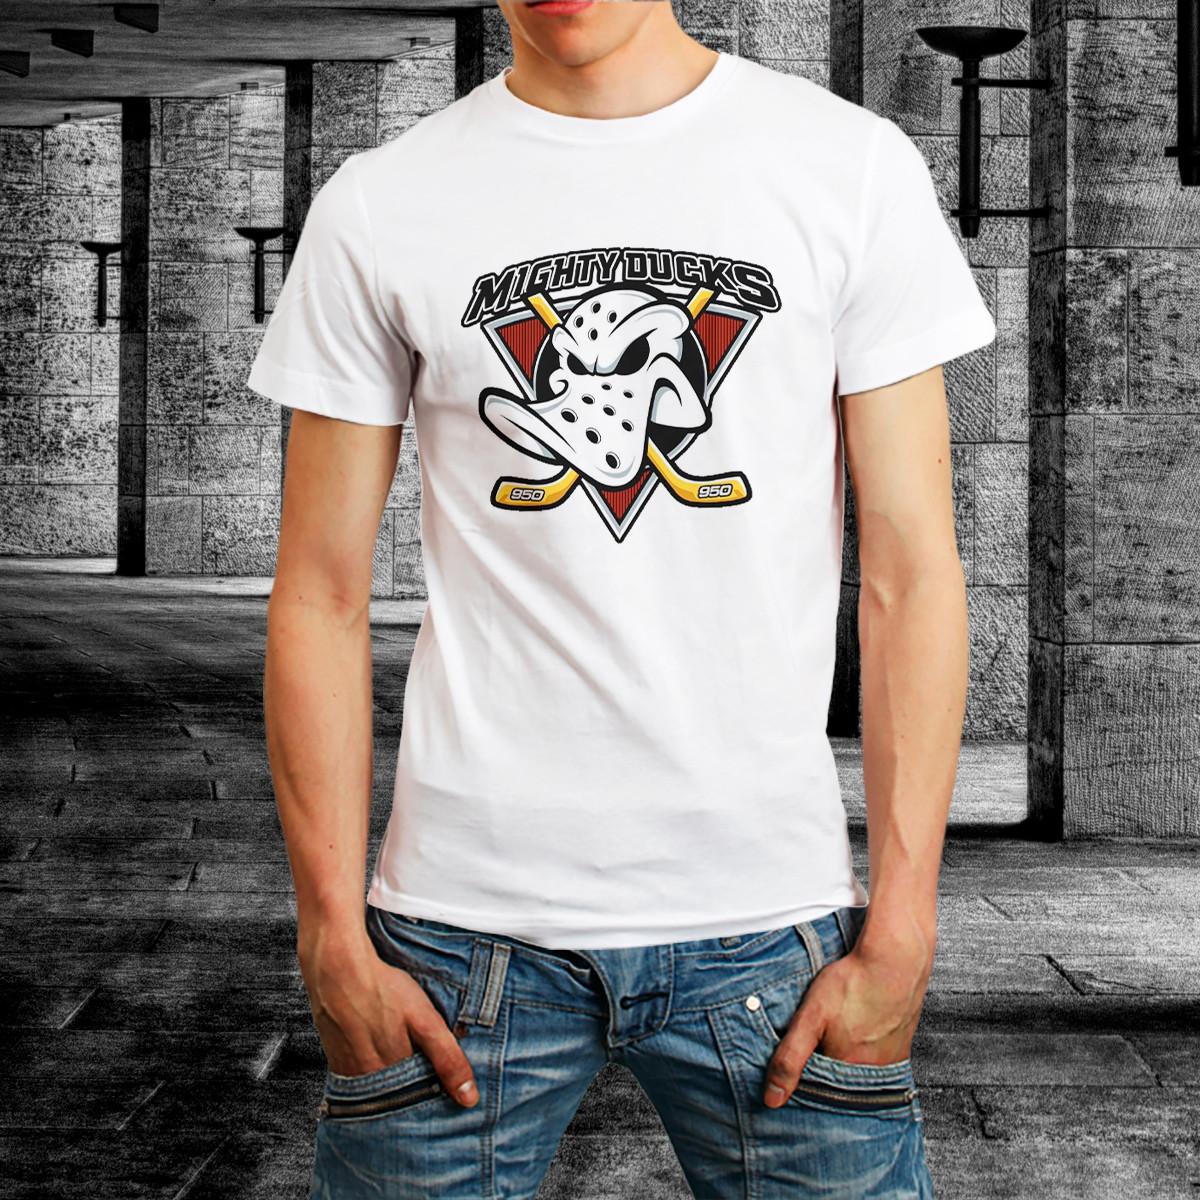 c2263c127 Camiseta Mighty Ducks Camisa Hockey NHL Personalizada no Elo7 ...